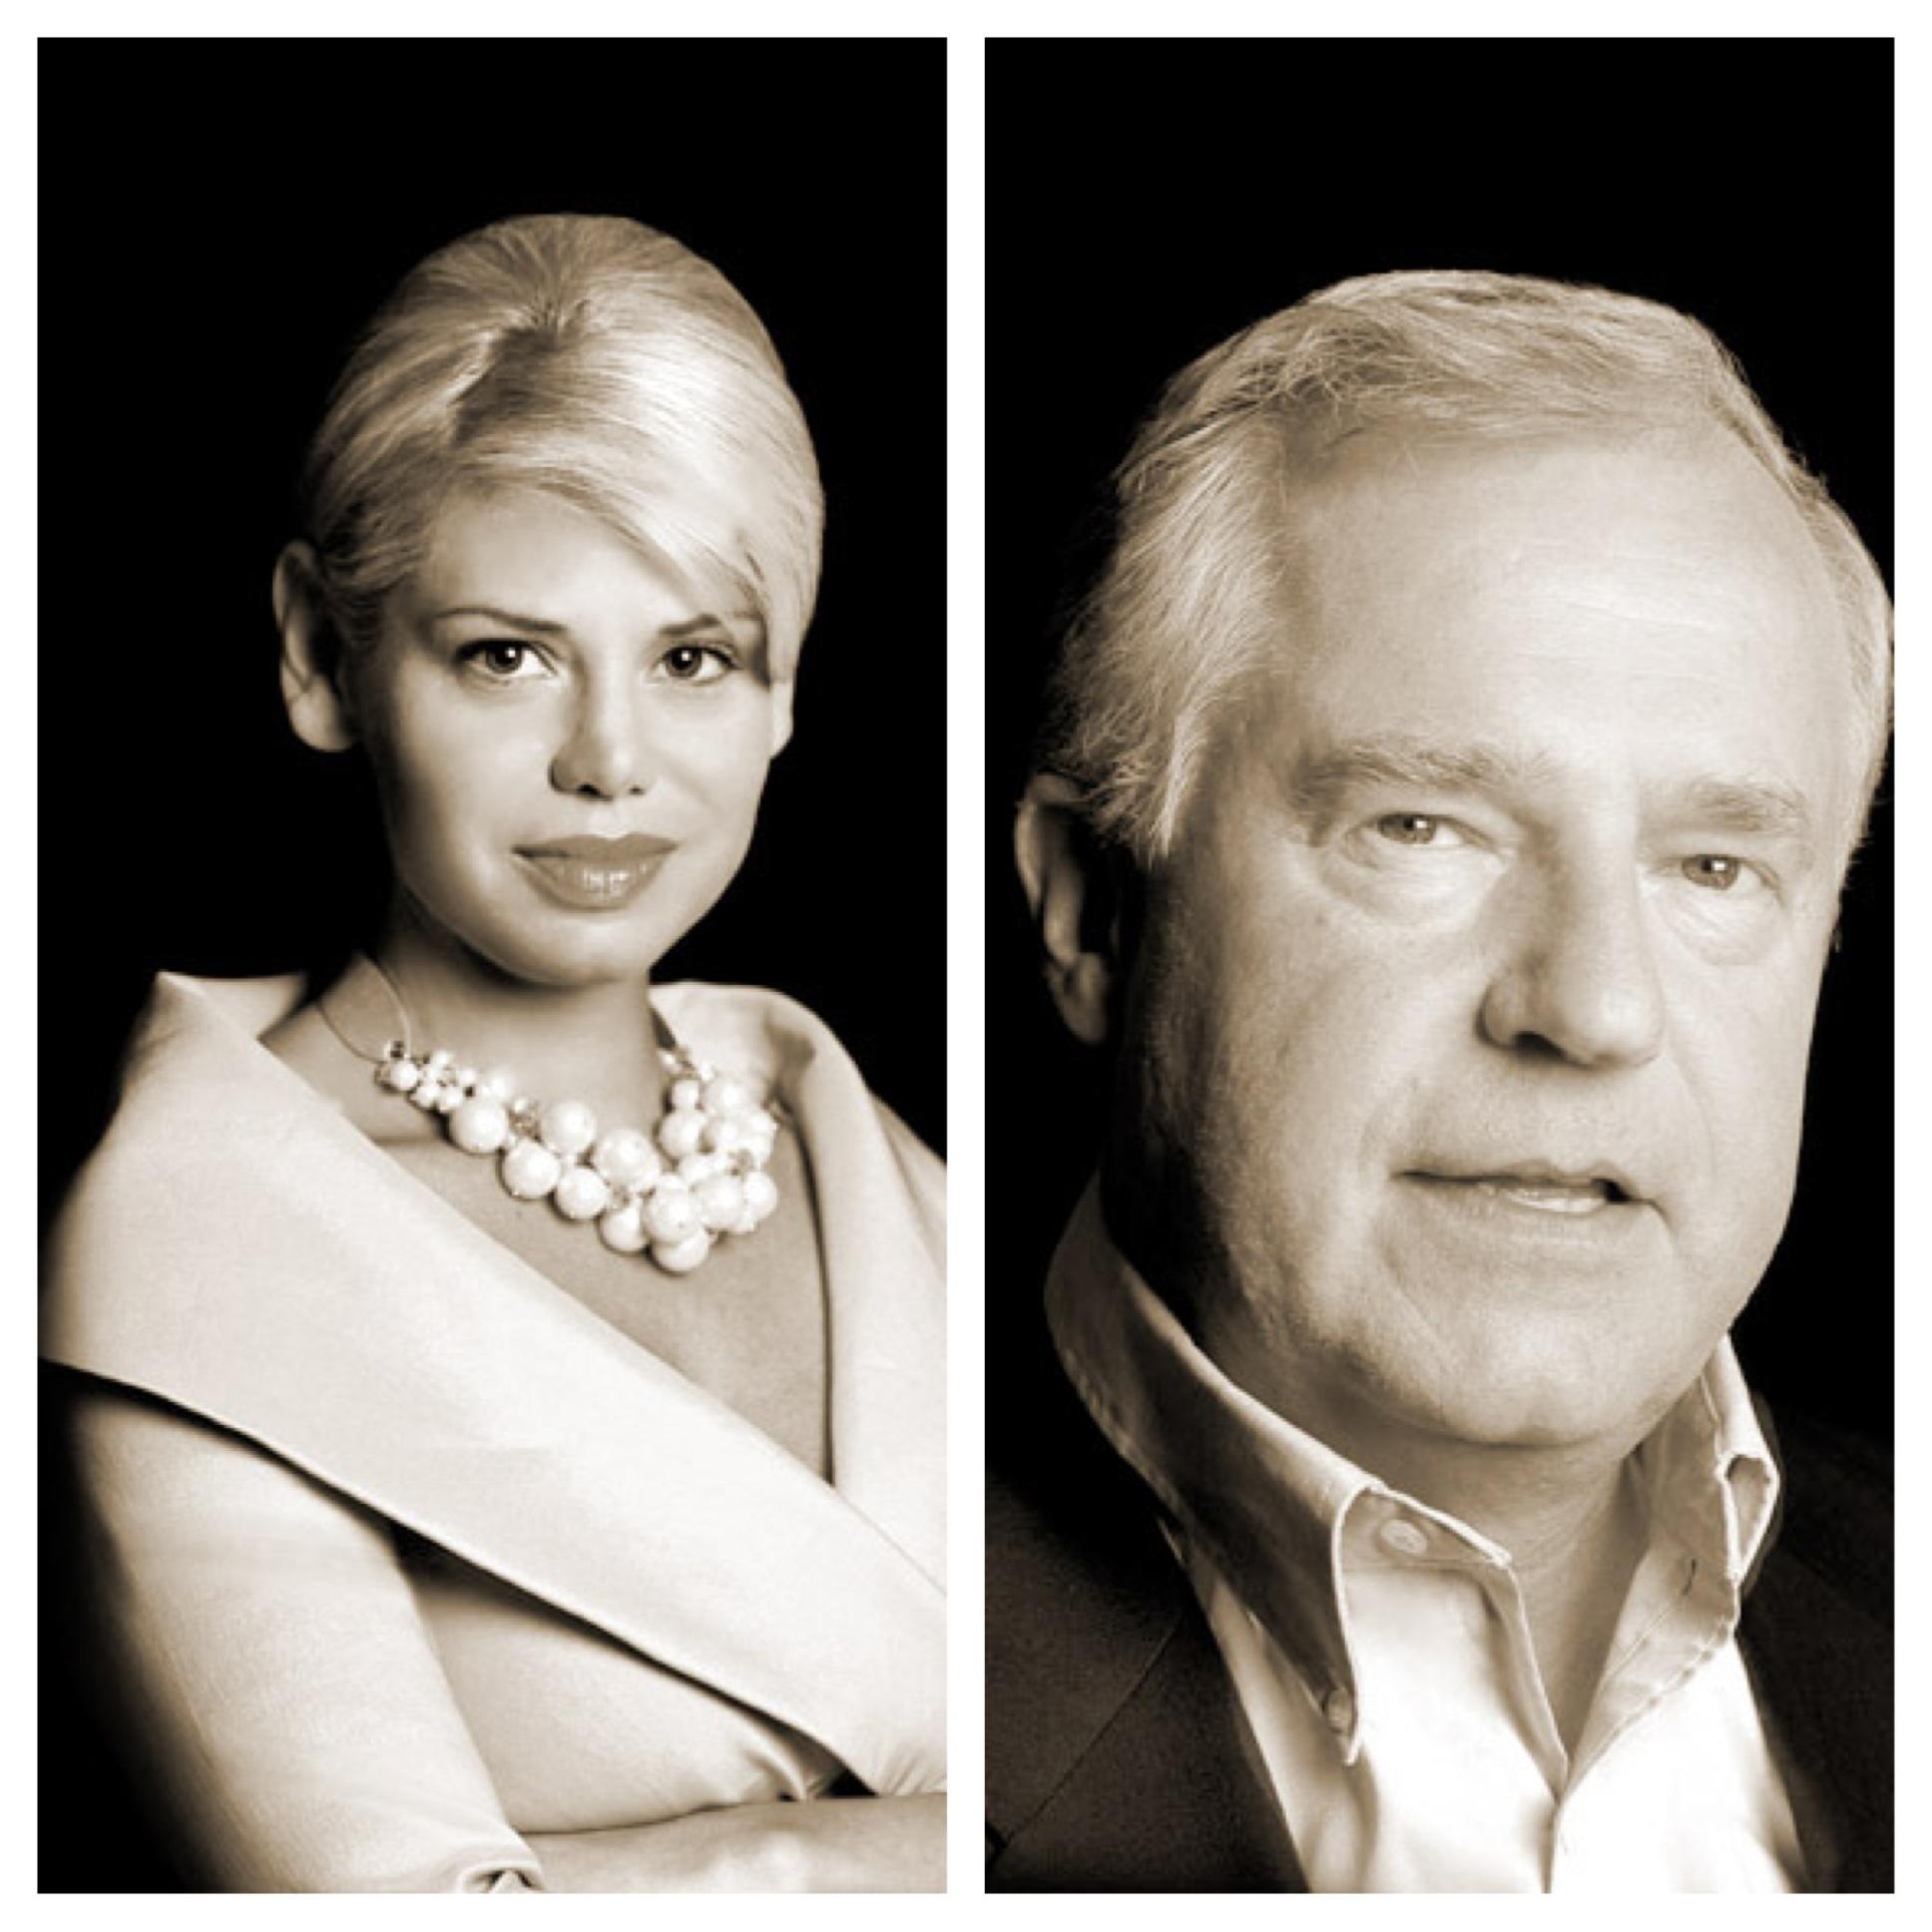 Company Founder - Christine Vadala & Bill Marthaler